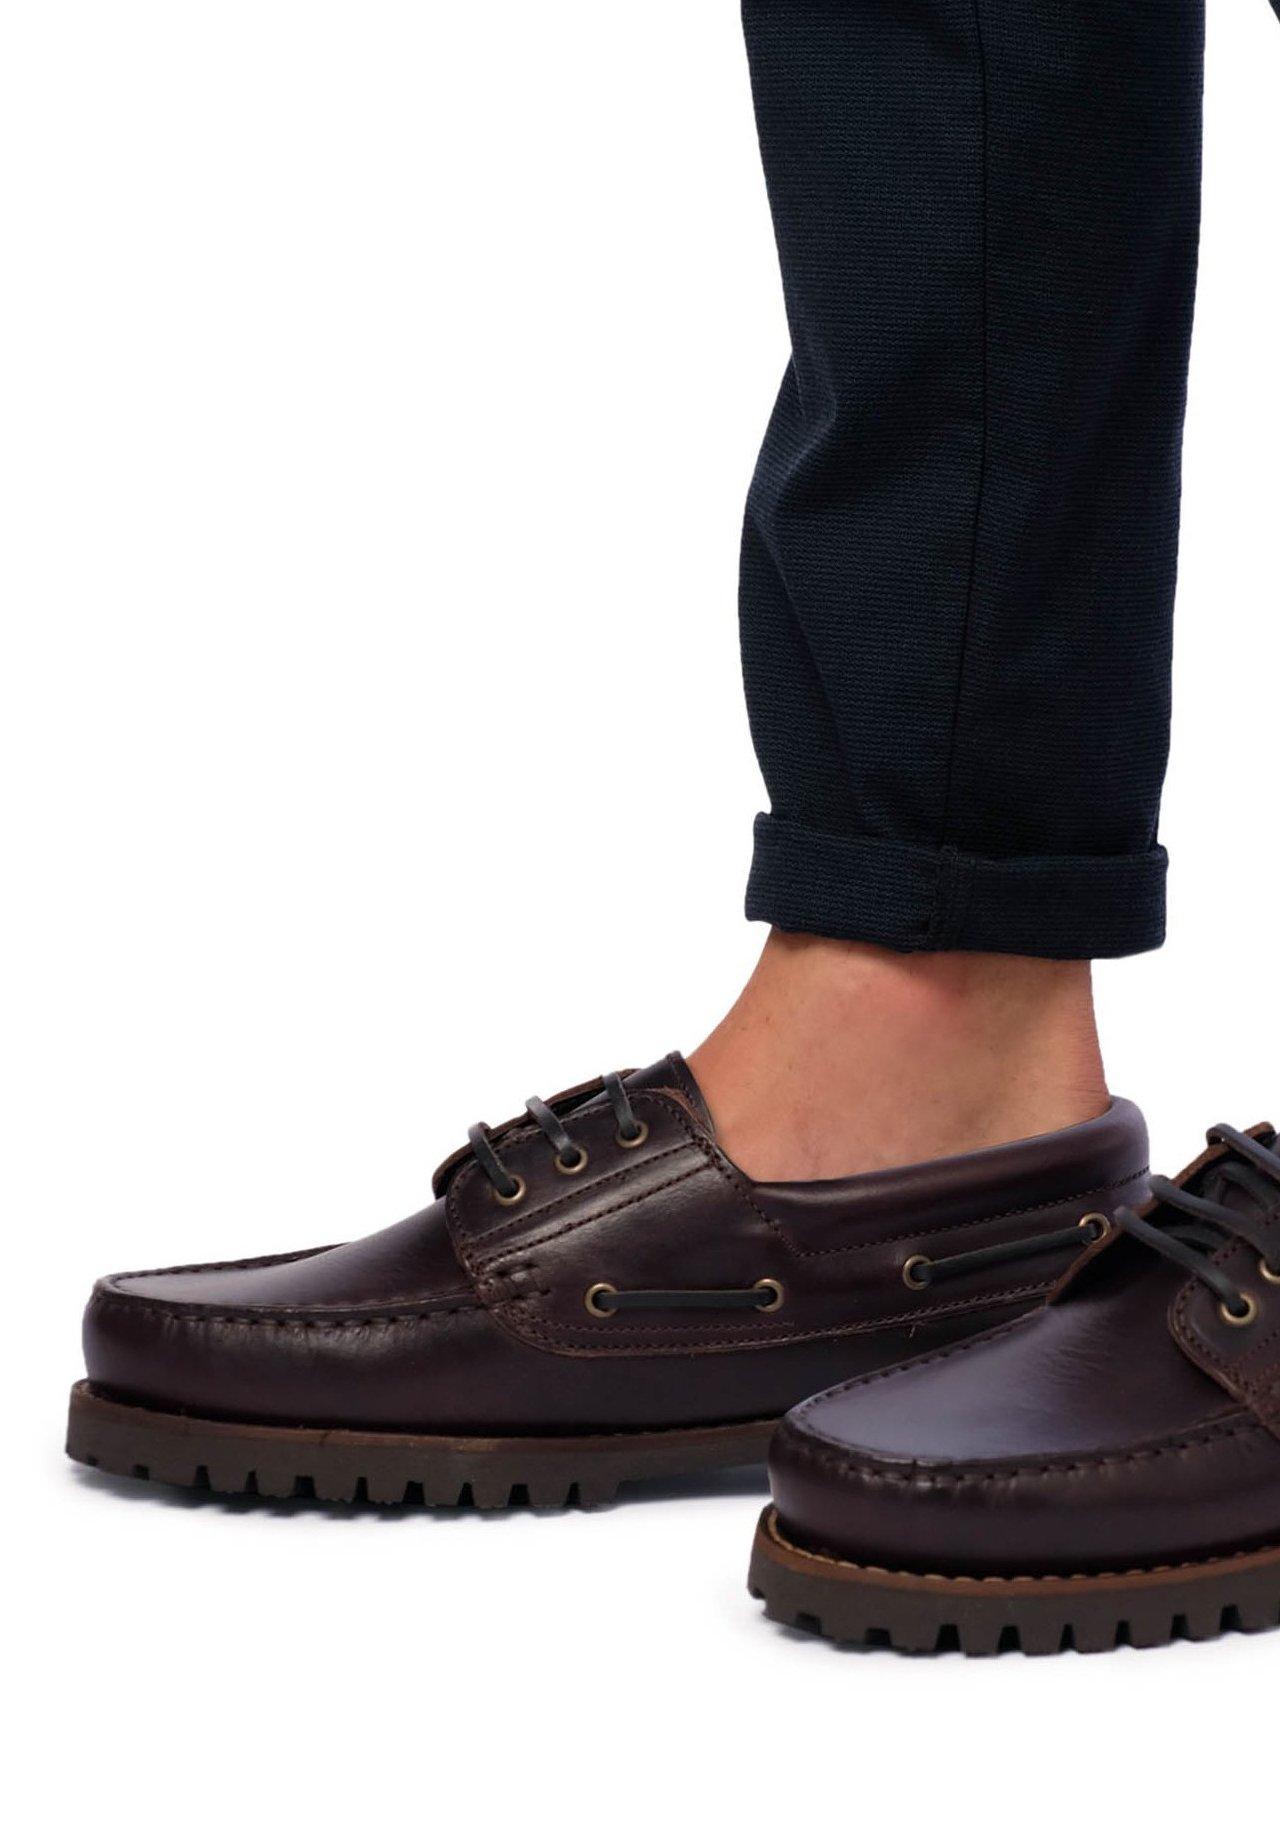 PULL&BEAR MIT JUTE SOHLE Chaussures bateau sand ZALANDO.FR